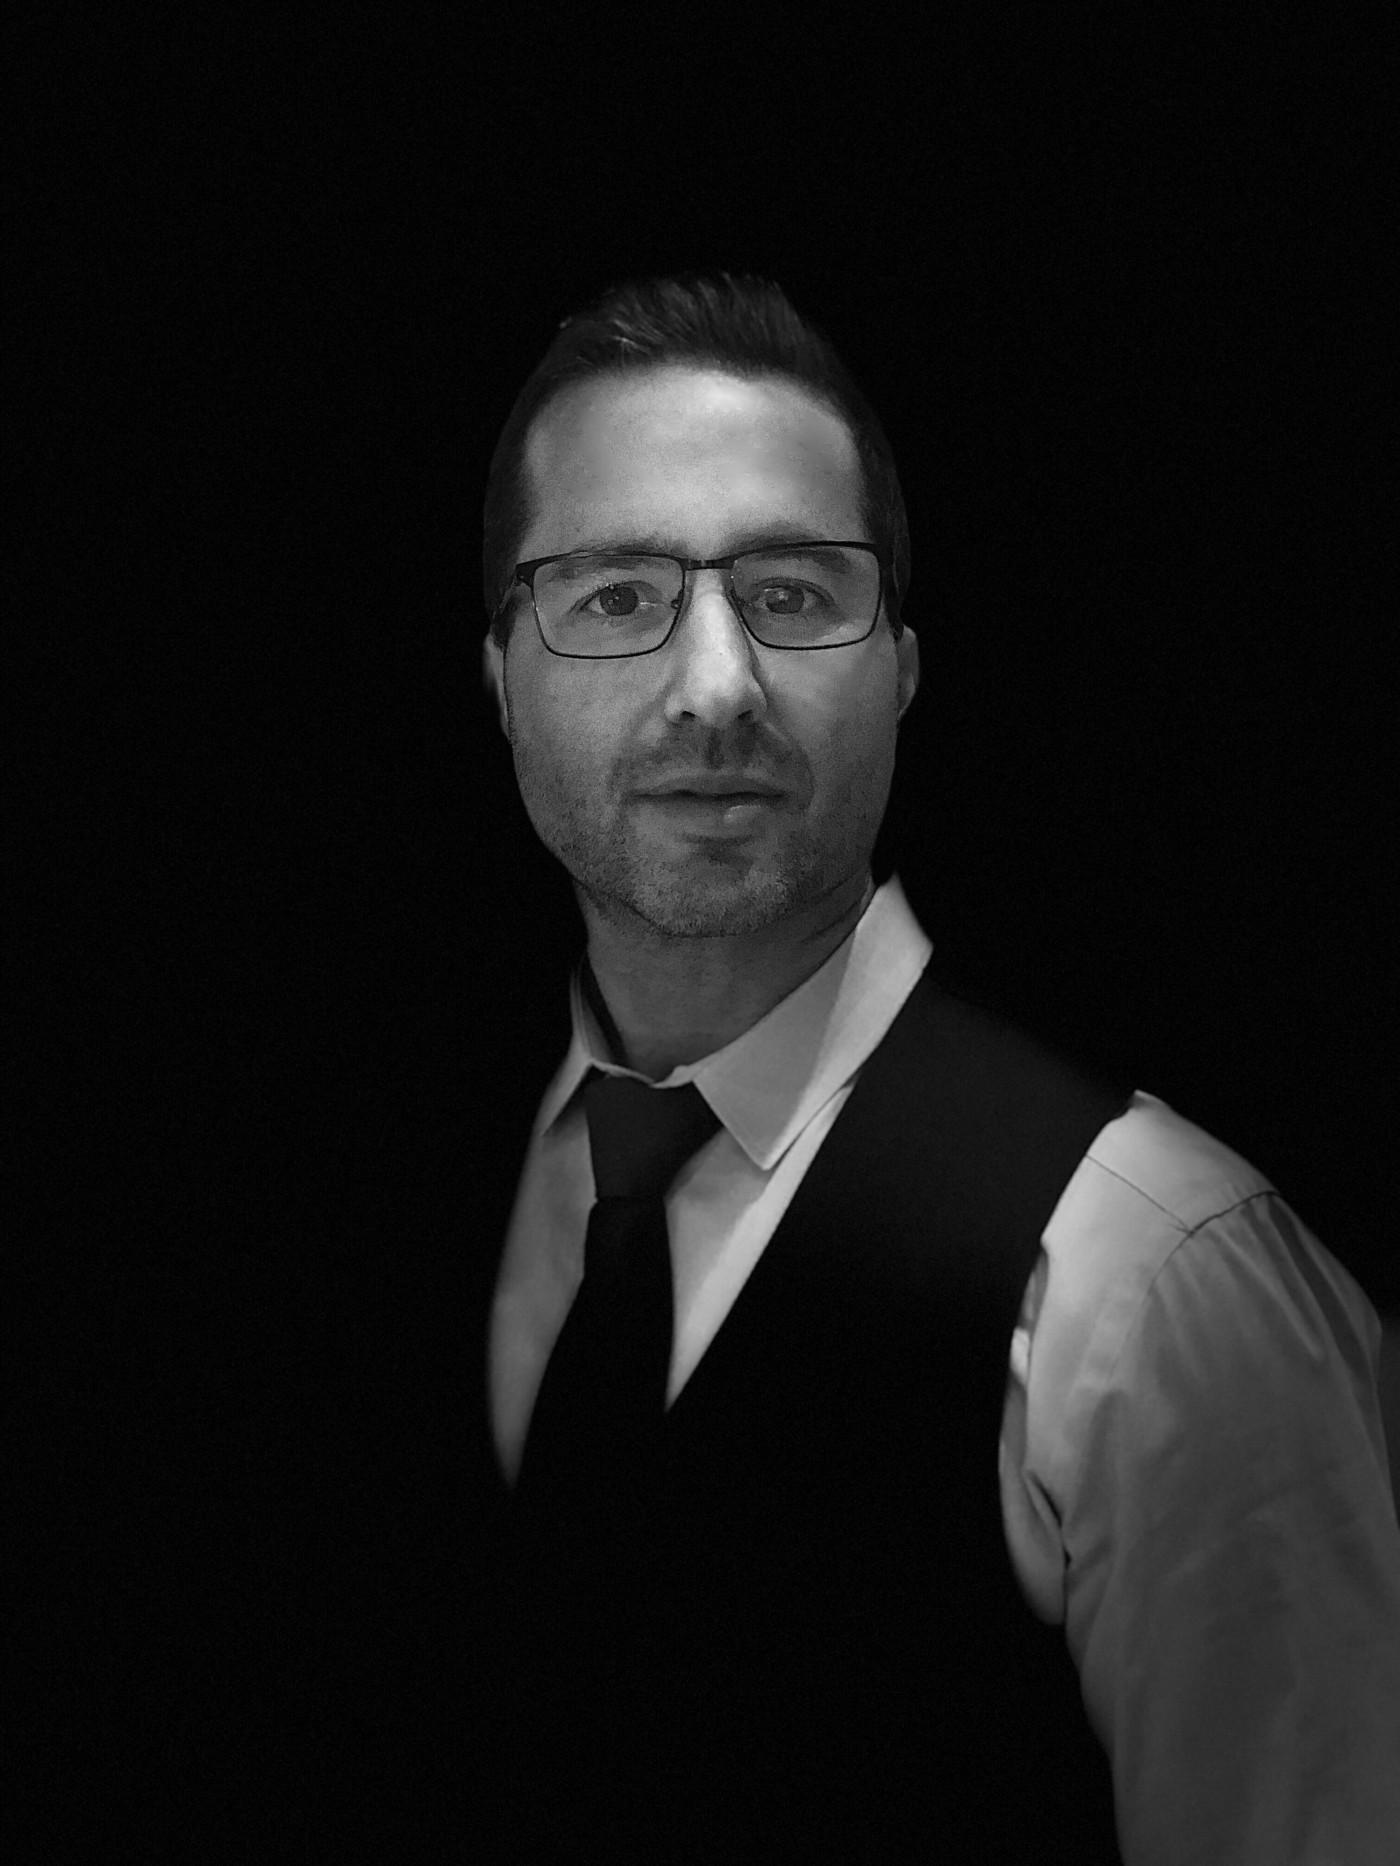 Interview with David Lane, CEO of Lunatix